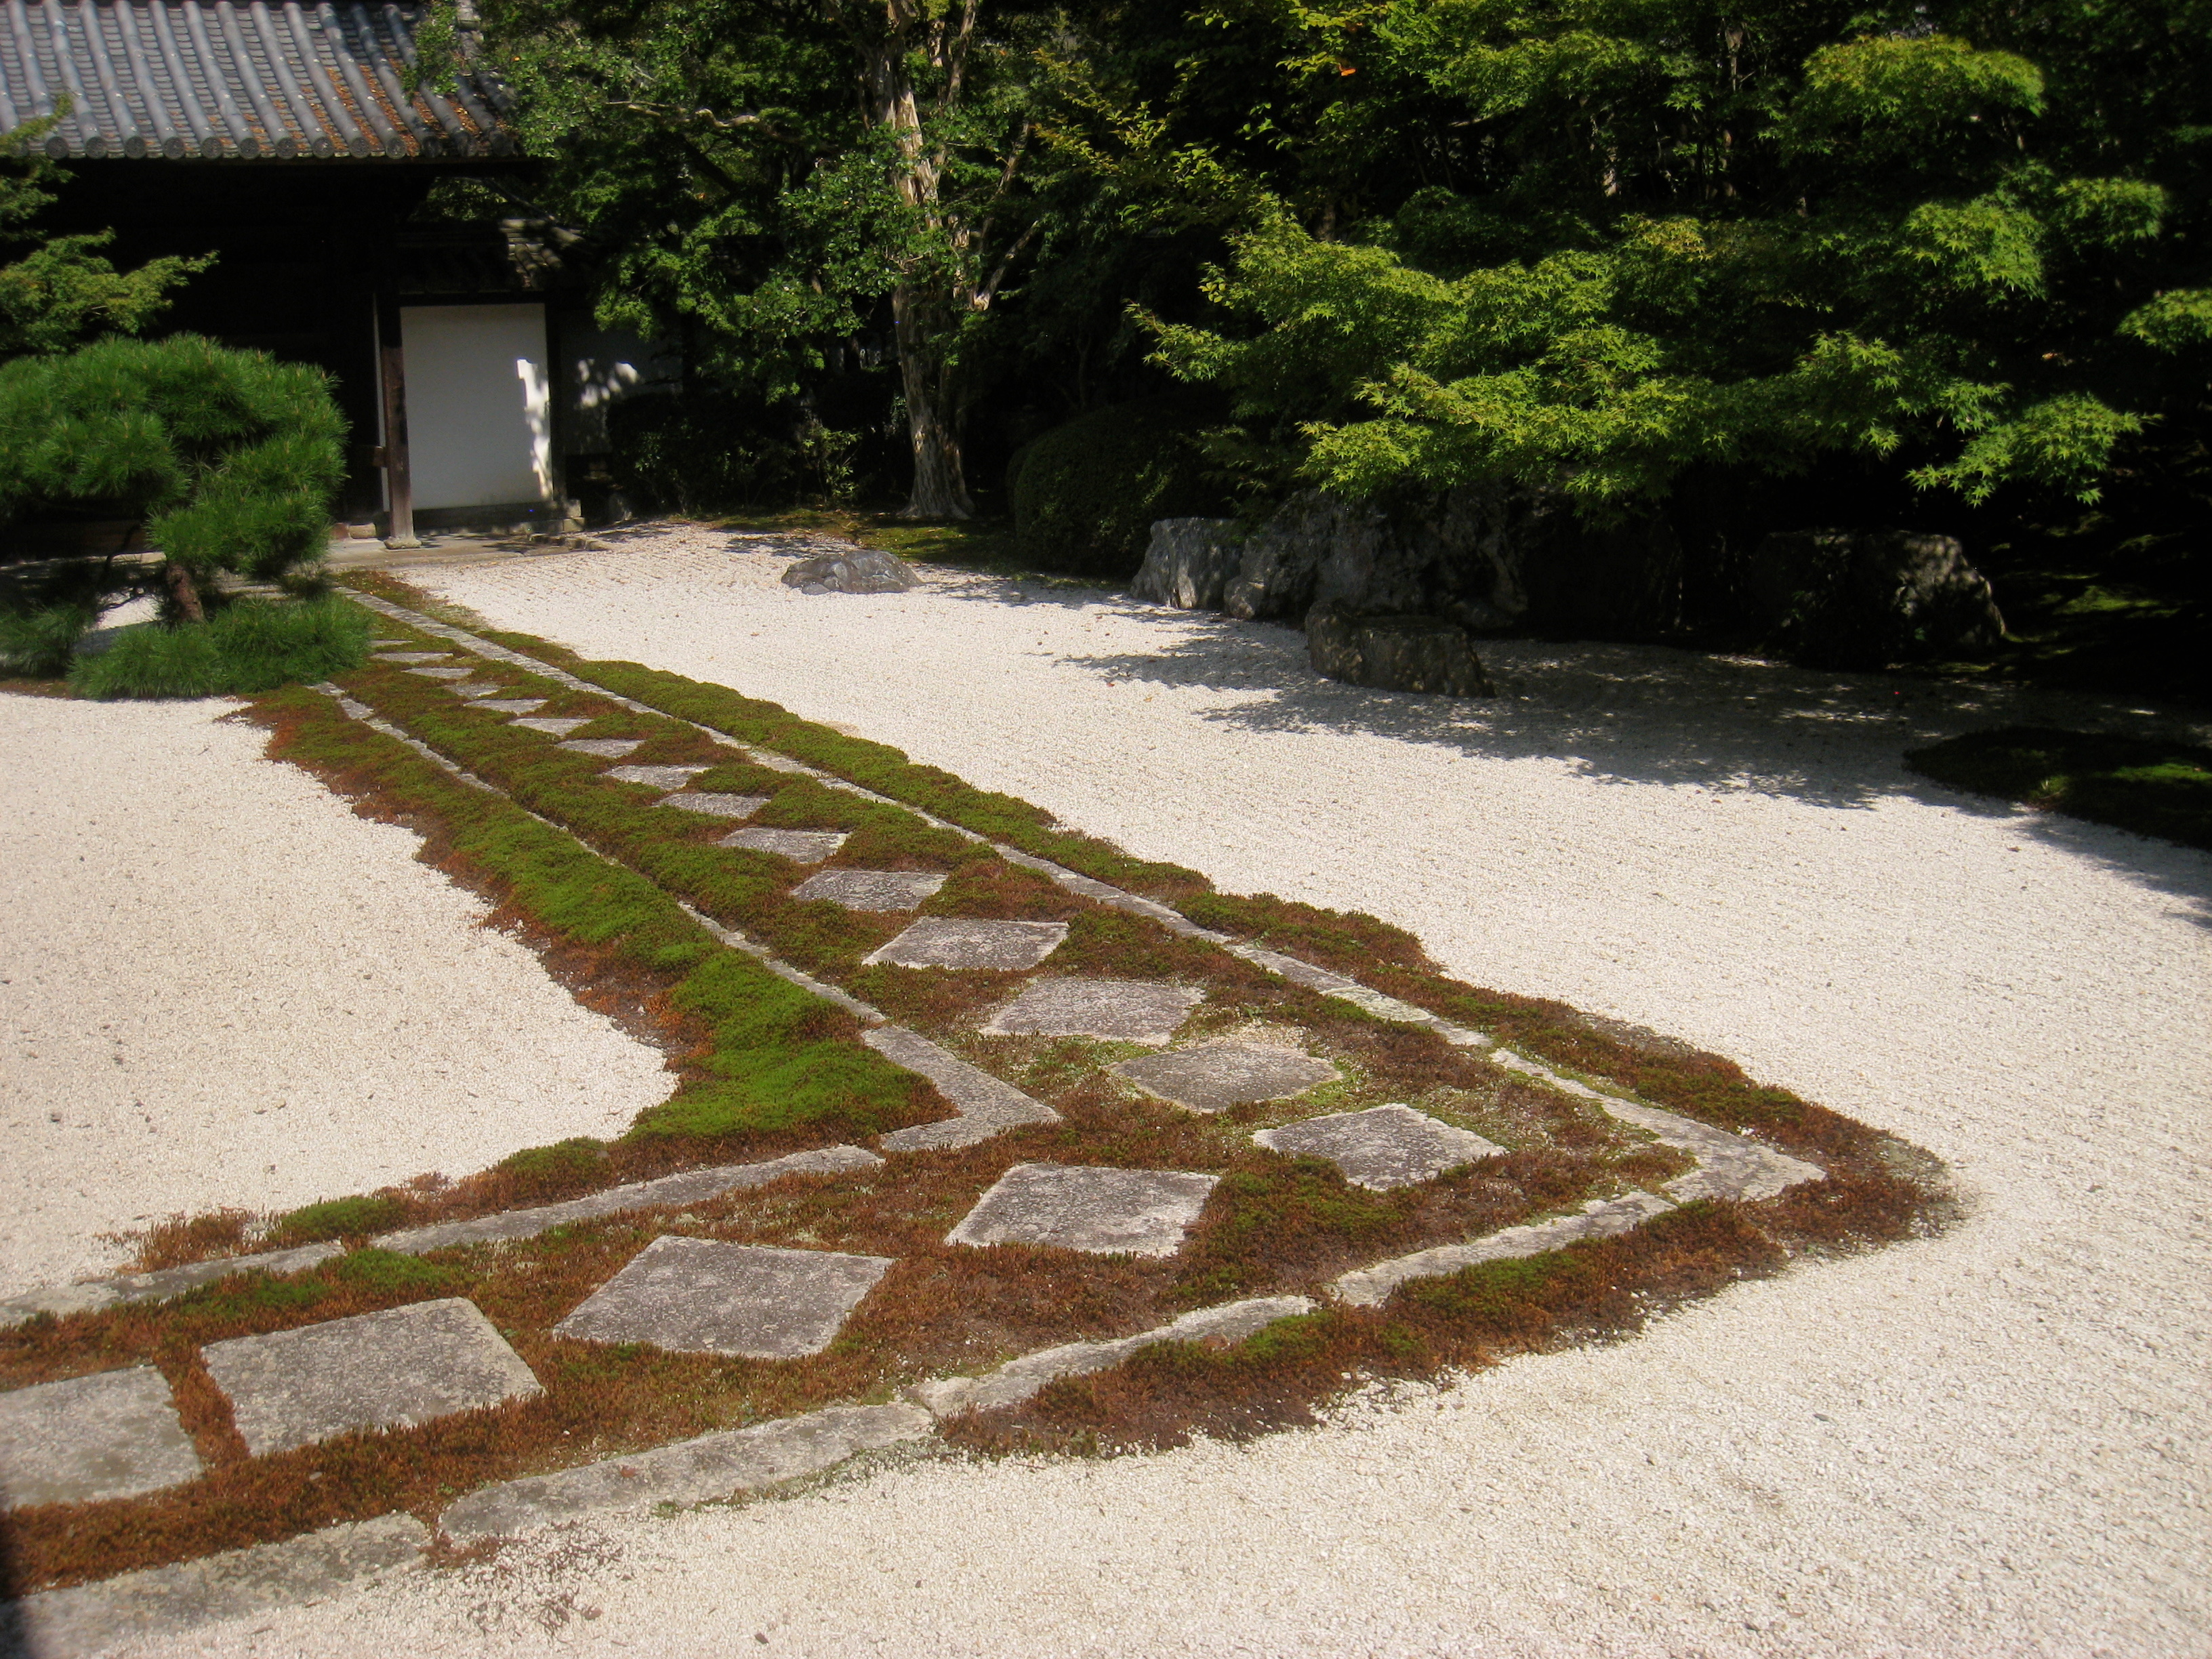 File:Tenjuan stone garden - Nanzenji - IMG 5353.JPG - Wikimedia Commons